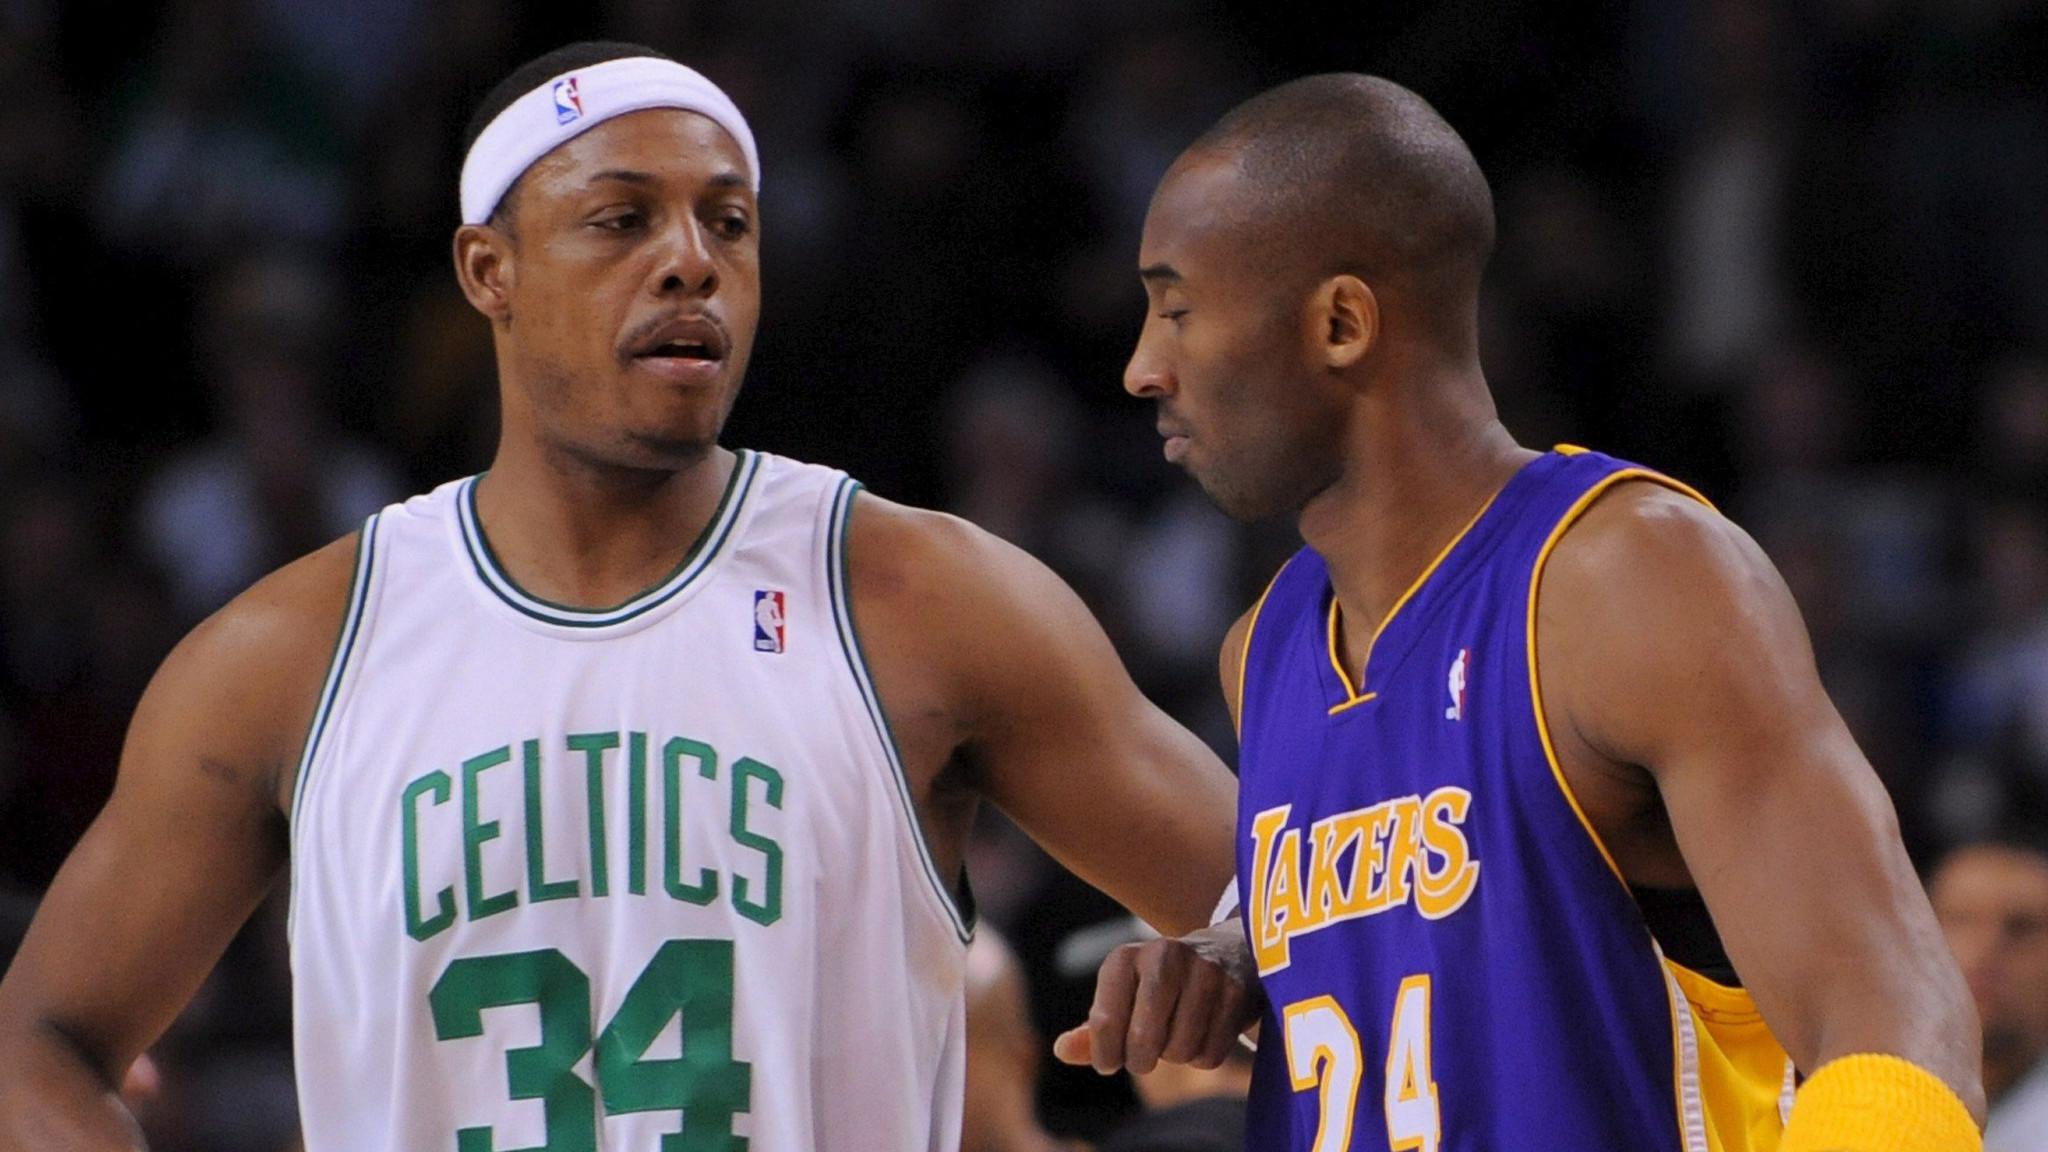 Paul Pierce says Kobe Bryant's season-ending injury 'saddens me'